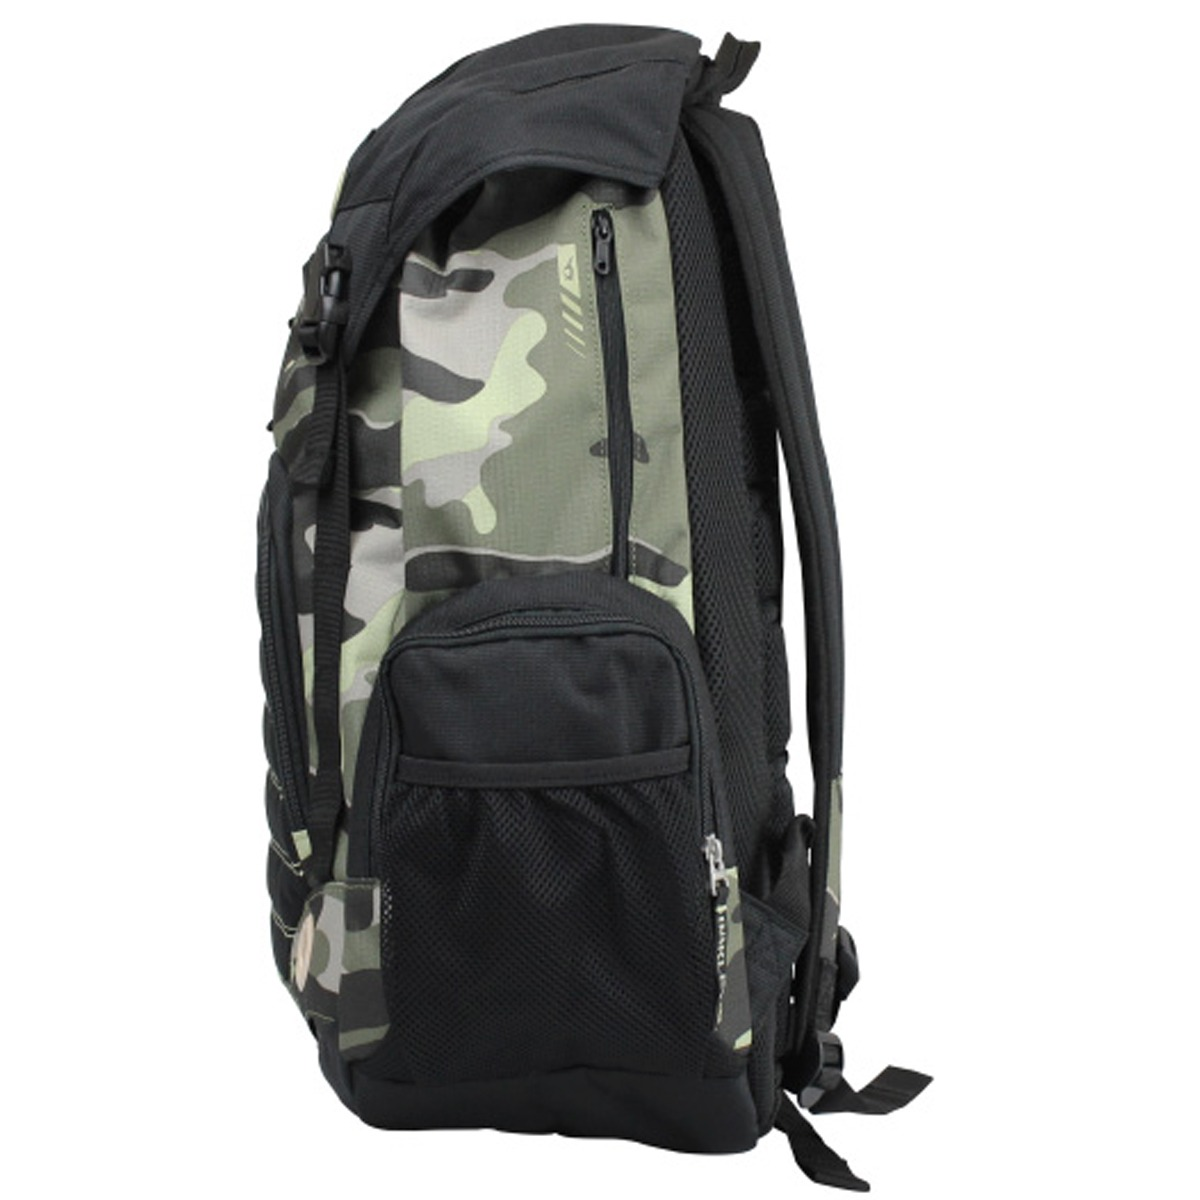 Mochila Oakley Gearbox 32l - R  499,90 em Mercado Livre 06323ab40d